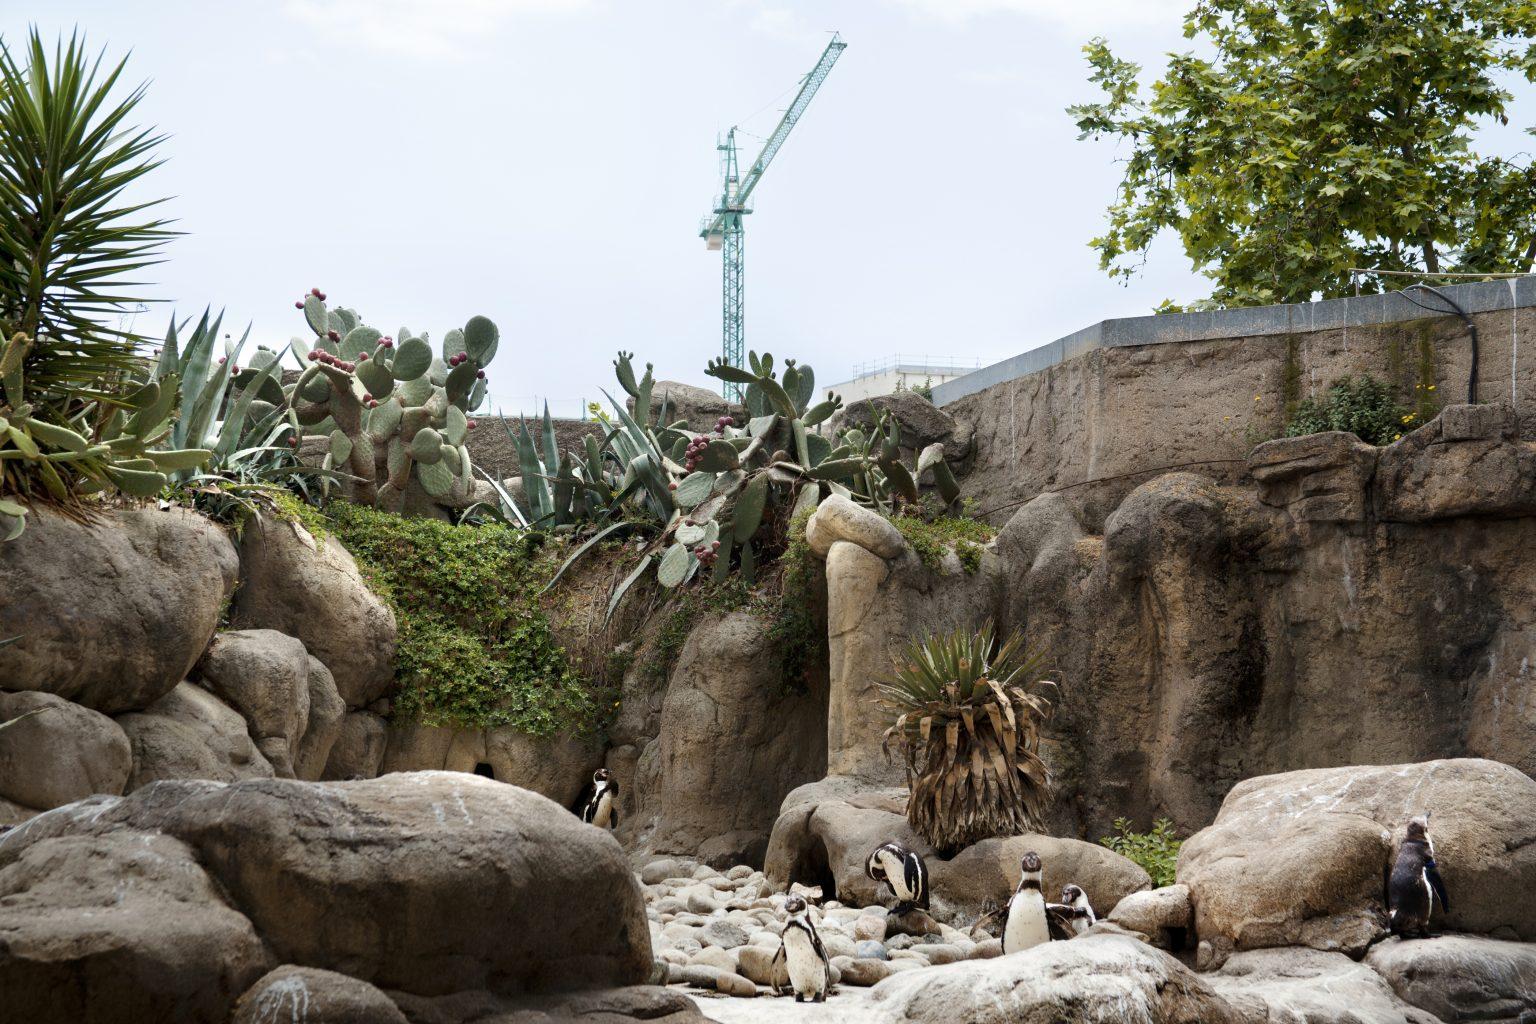 Barcelona, May 2013 - zoological garden, Humboldt penguins. >< Barcellona, maggio 2013 - giardino zoologico, pinguini di Humboldt.